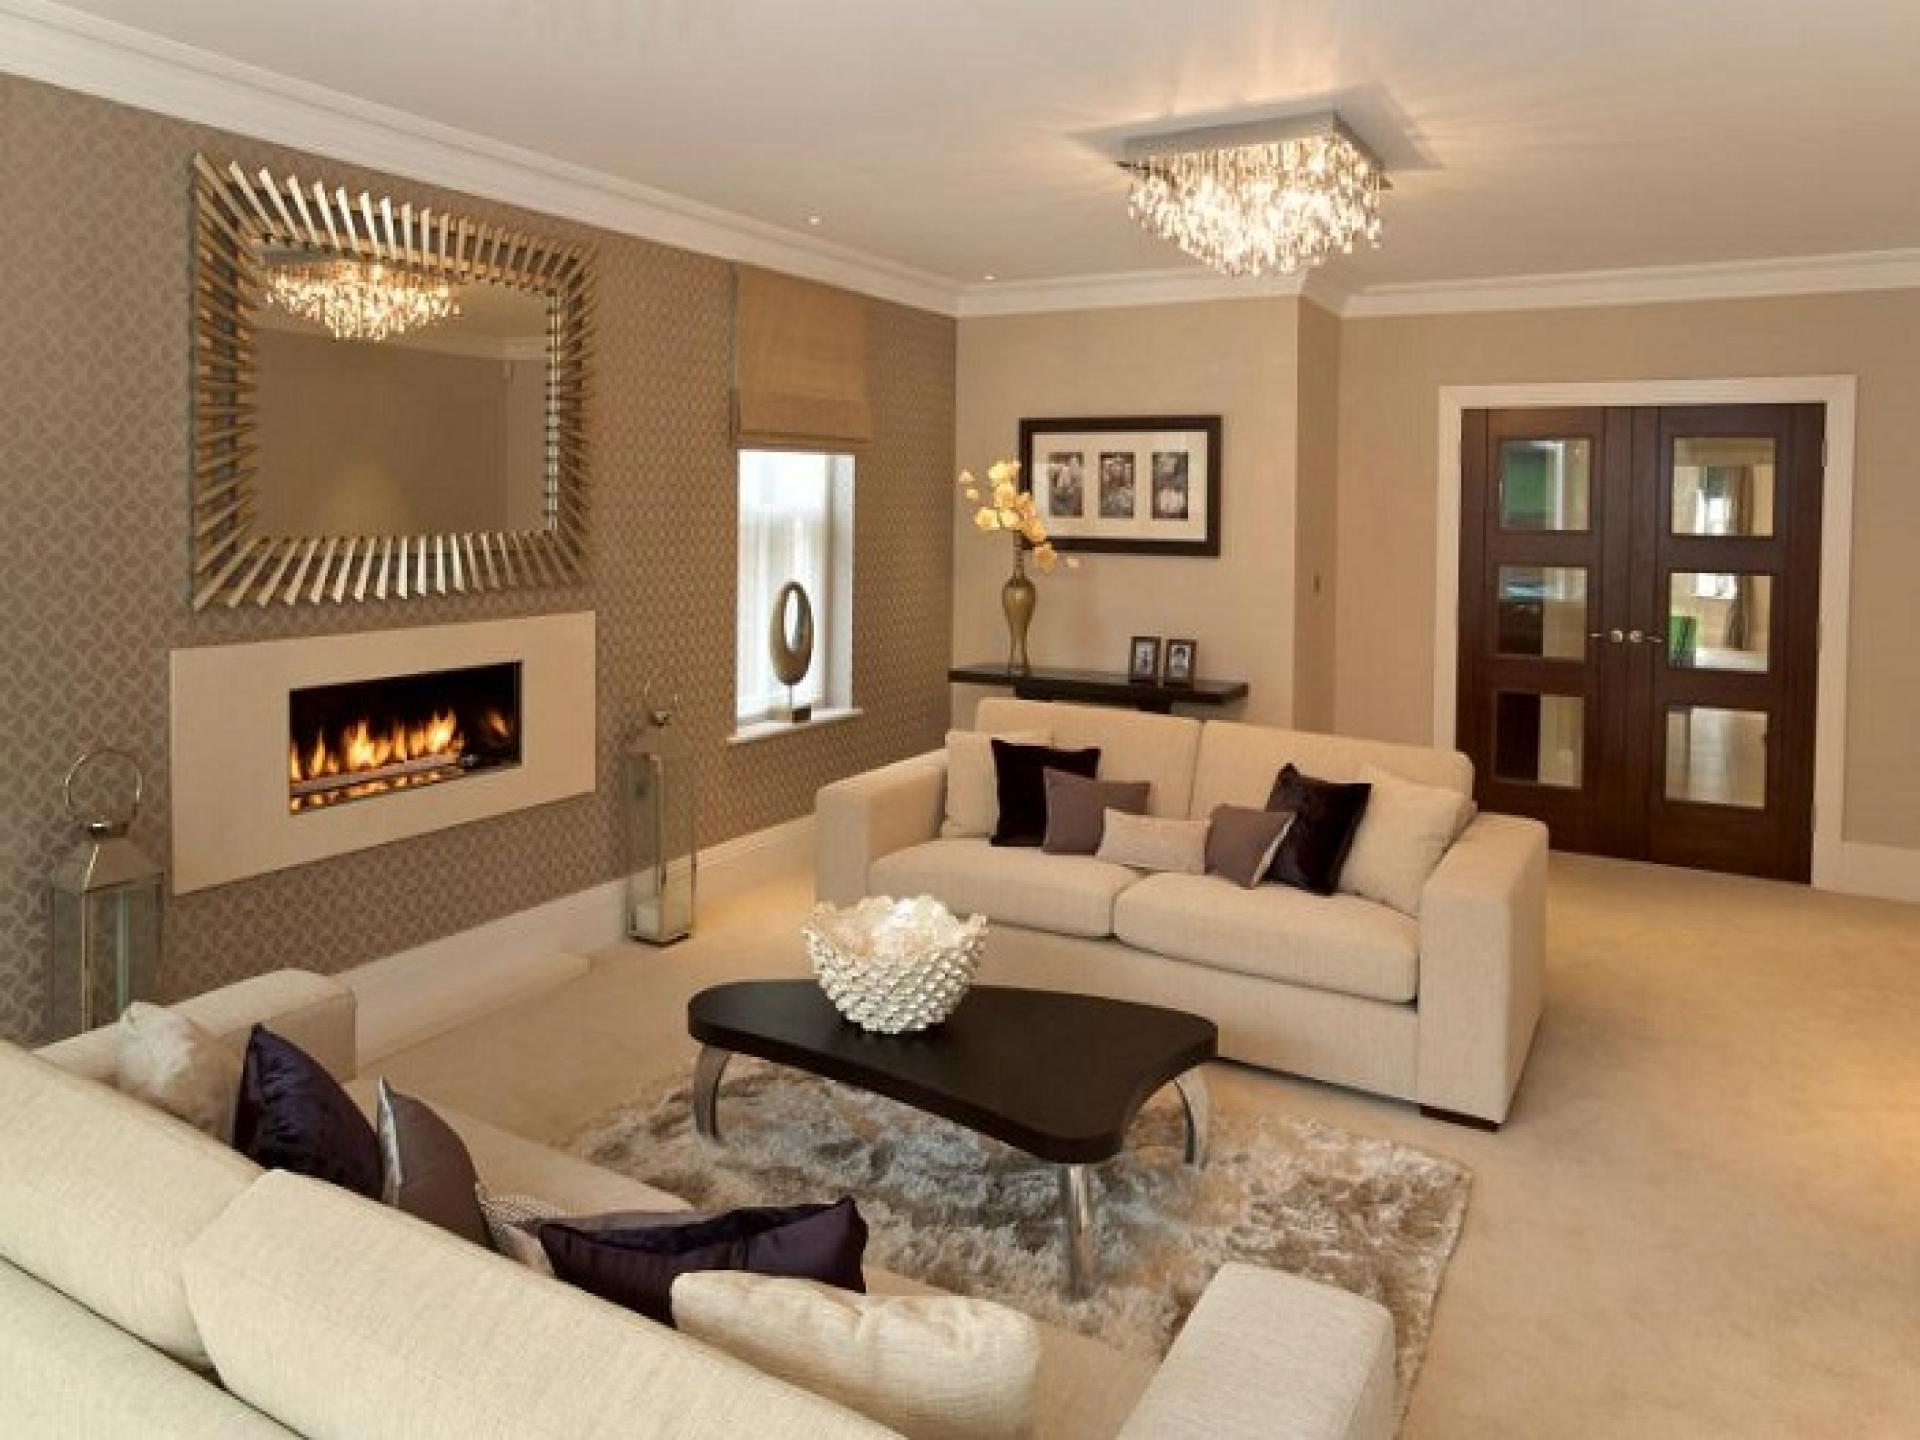 living room paint ideas exquisite living room colors ideas 2015  564d5db068cf8b20463499cfb0c6171e.jpg living room full version ... BTNJACG